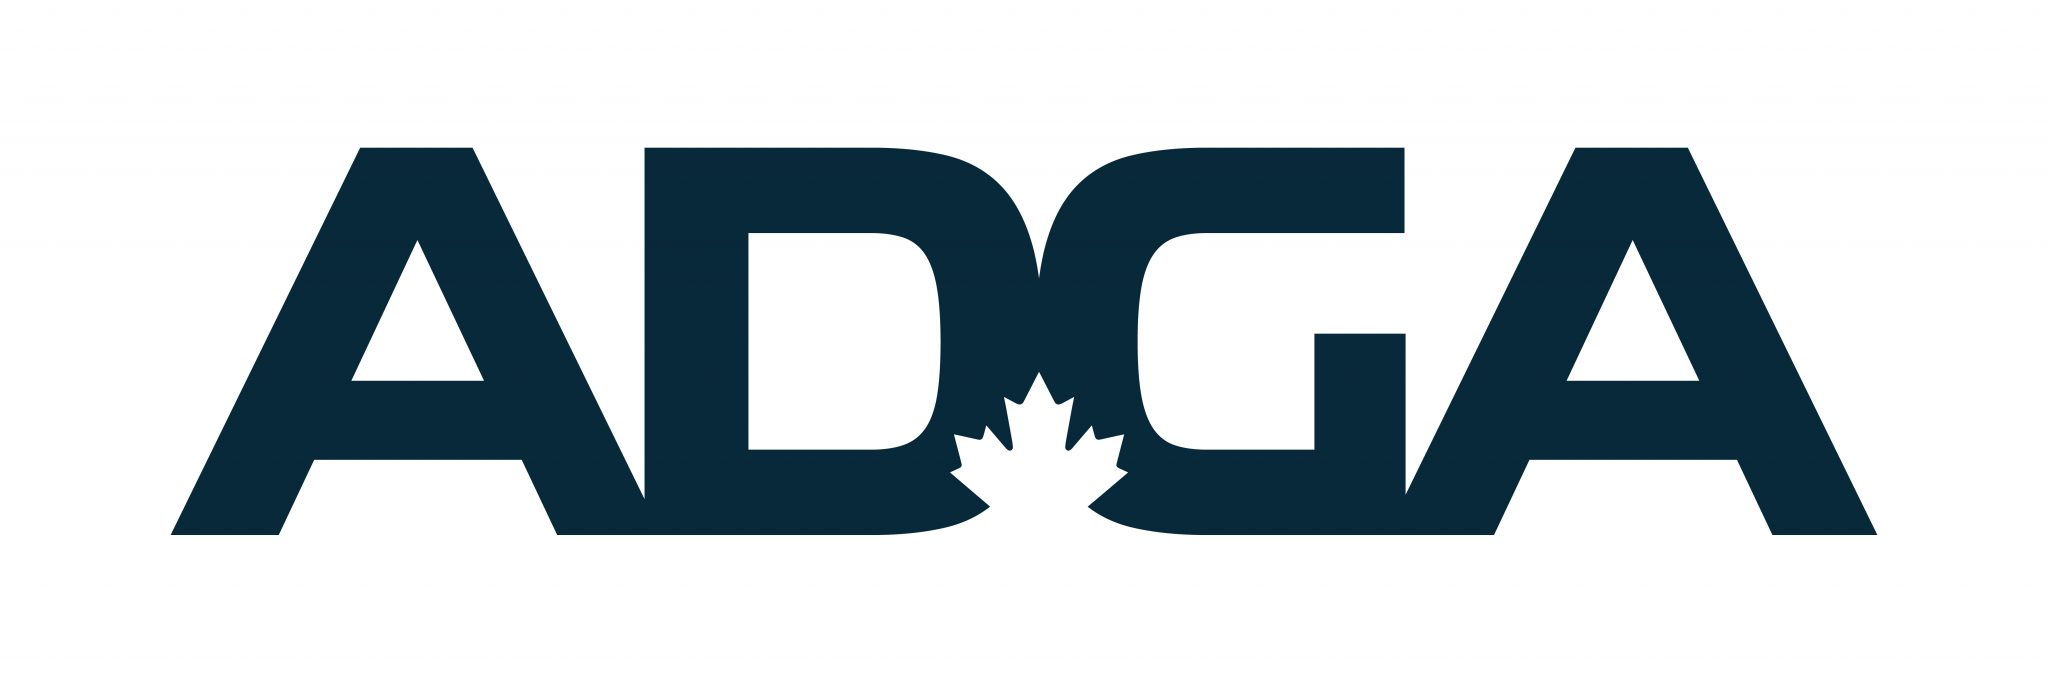 ADGA Seeks Electronics Technician